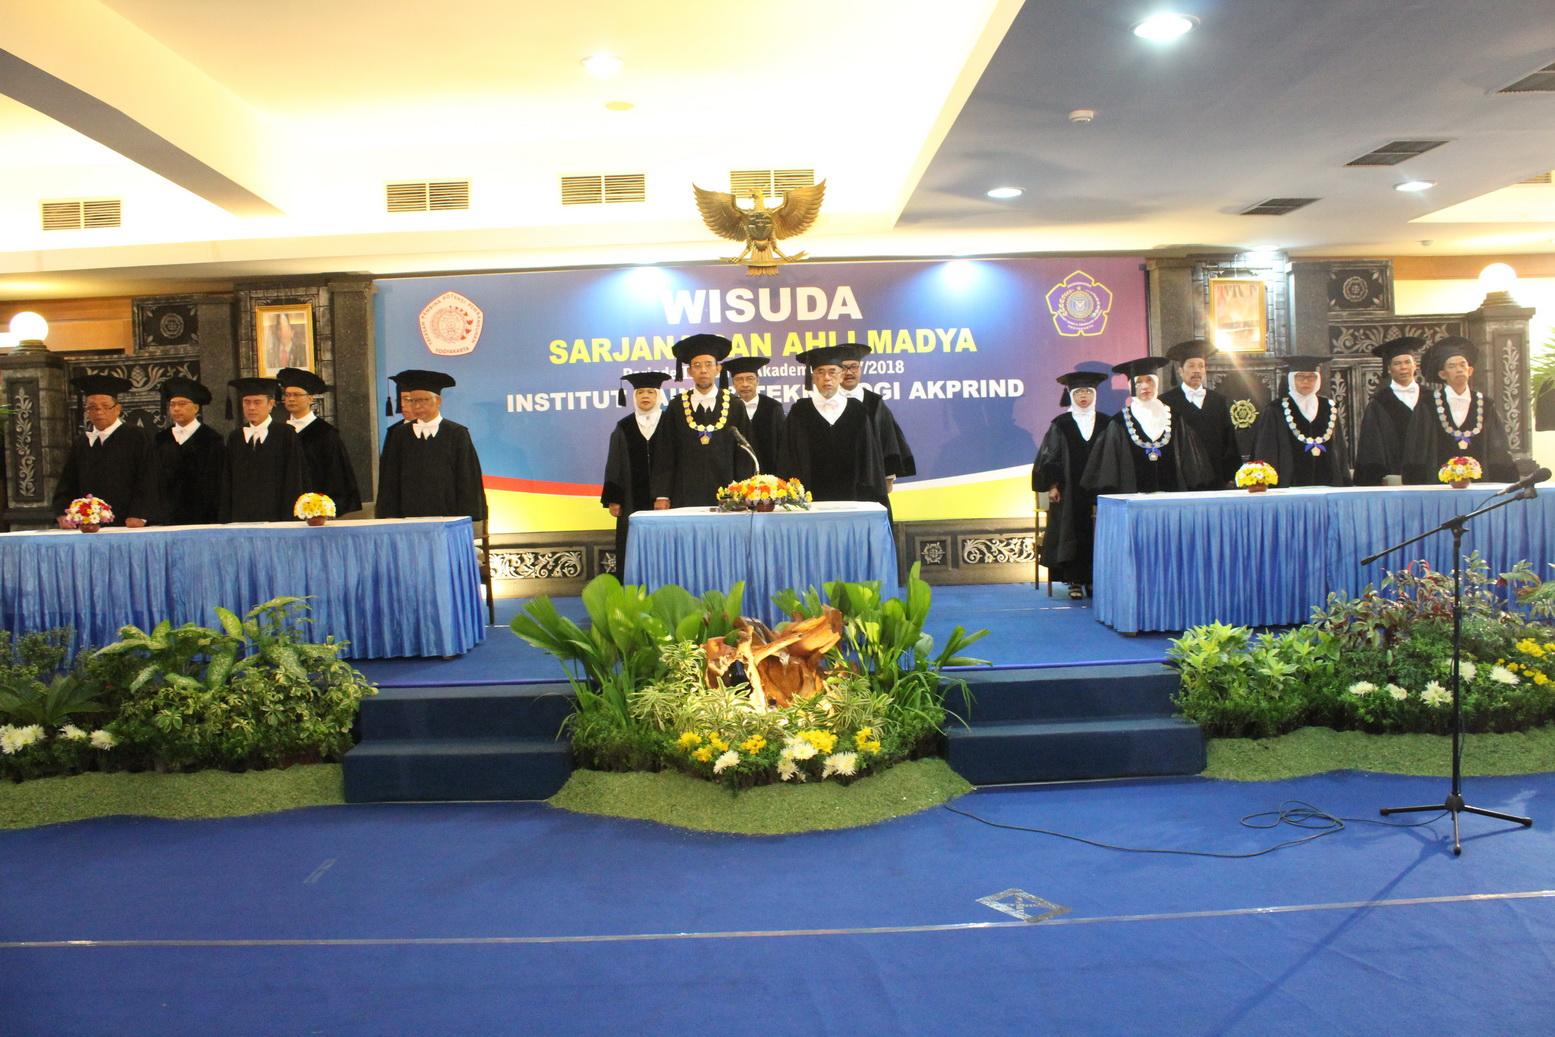 Wisuda Sarjana dan Ahli Madya IST AKPRIND Periode III Tahun Akademik 2017/2018